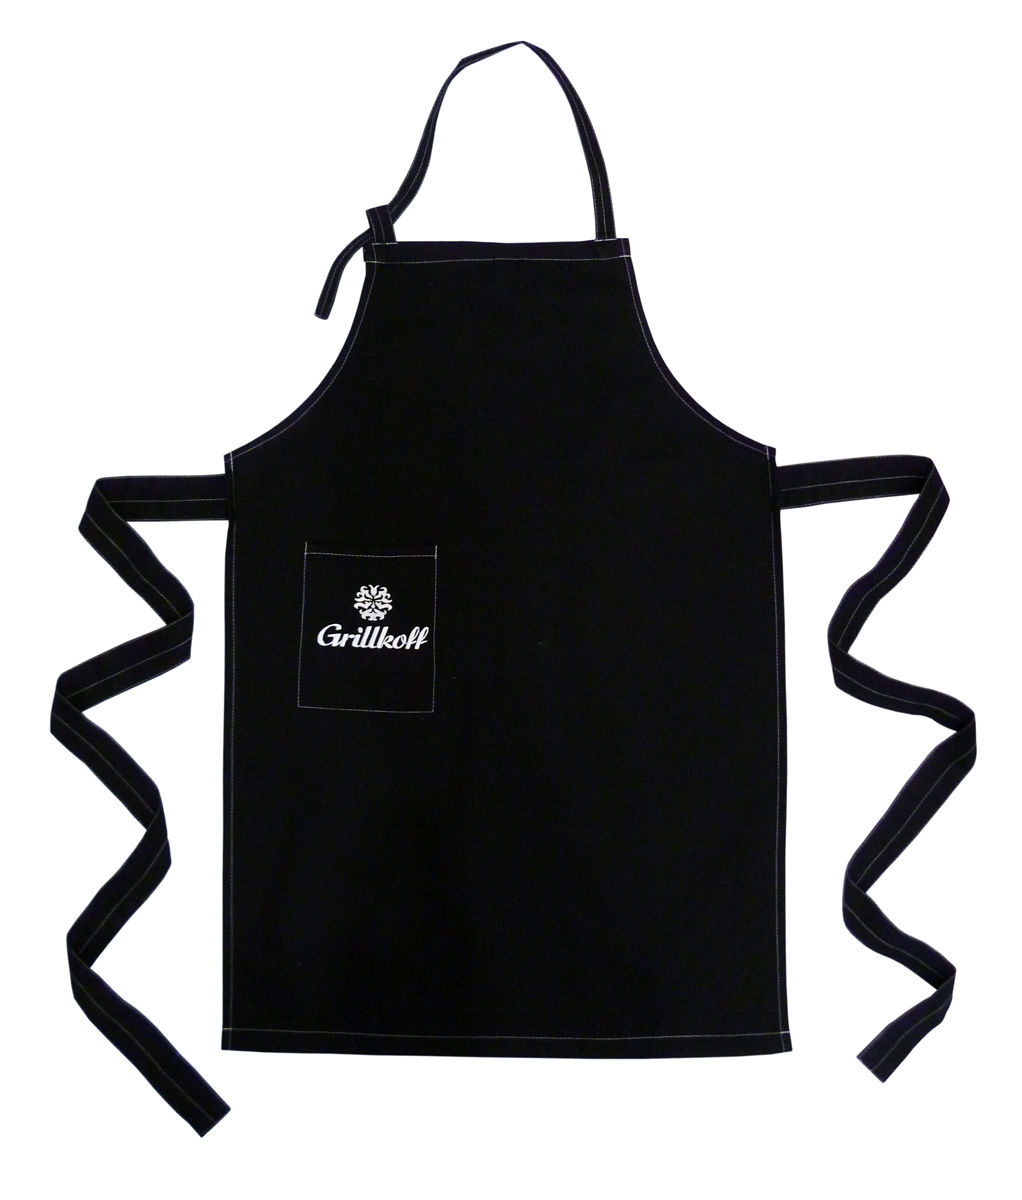 Фартук для гриля Grillkoff панели для кухни фартук в курске